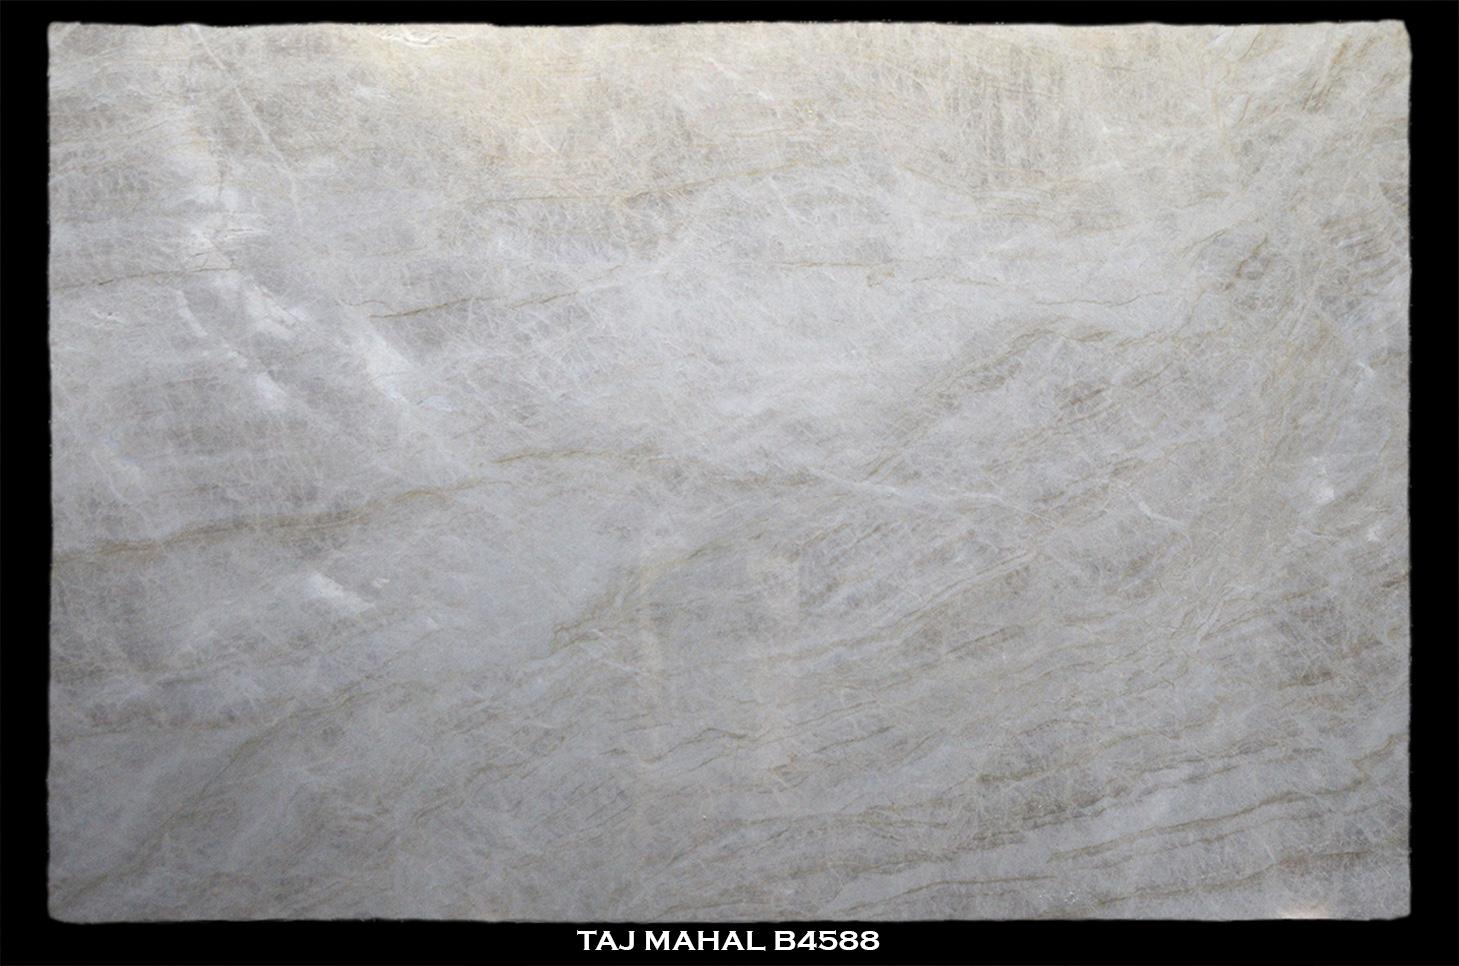 TAJ-MAHAL-B4588-SLAB